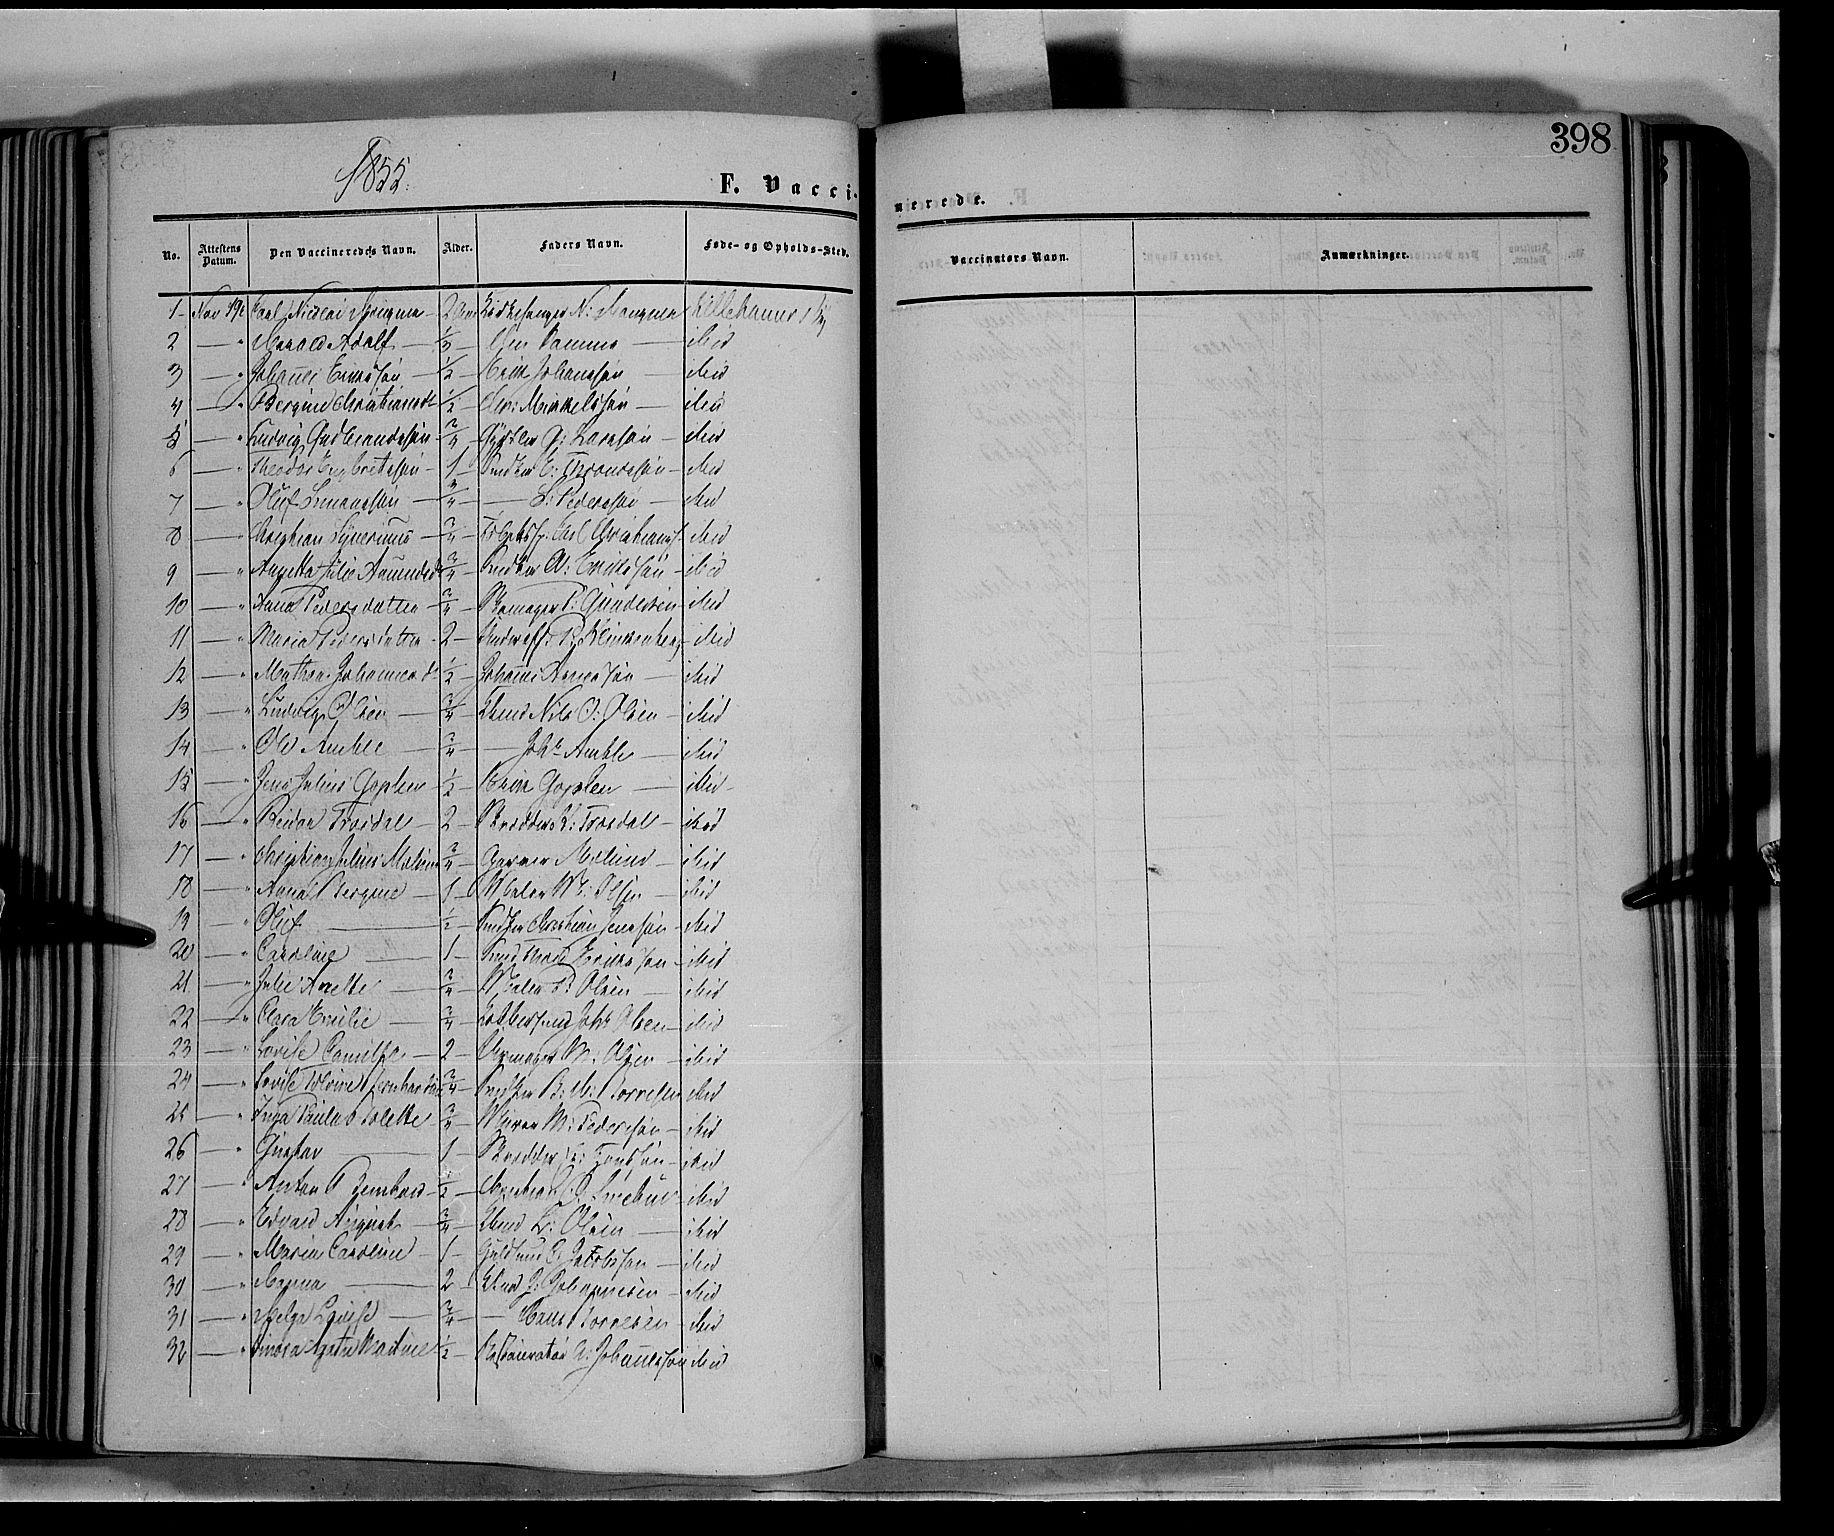 SAH, Fåberg prestekontor, Ministerialbok nr. 6B, 1855-1867, s. 398